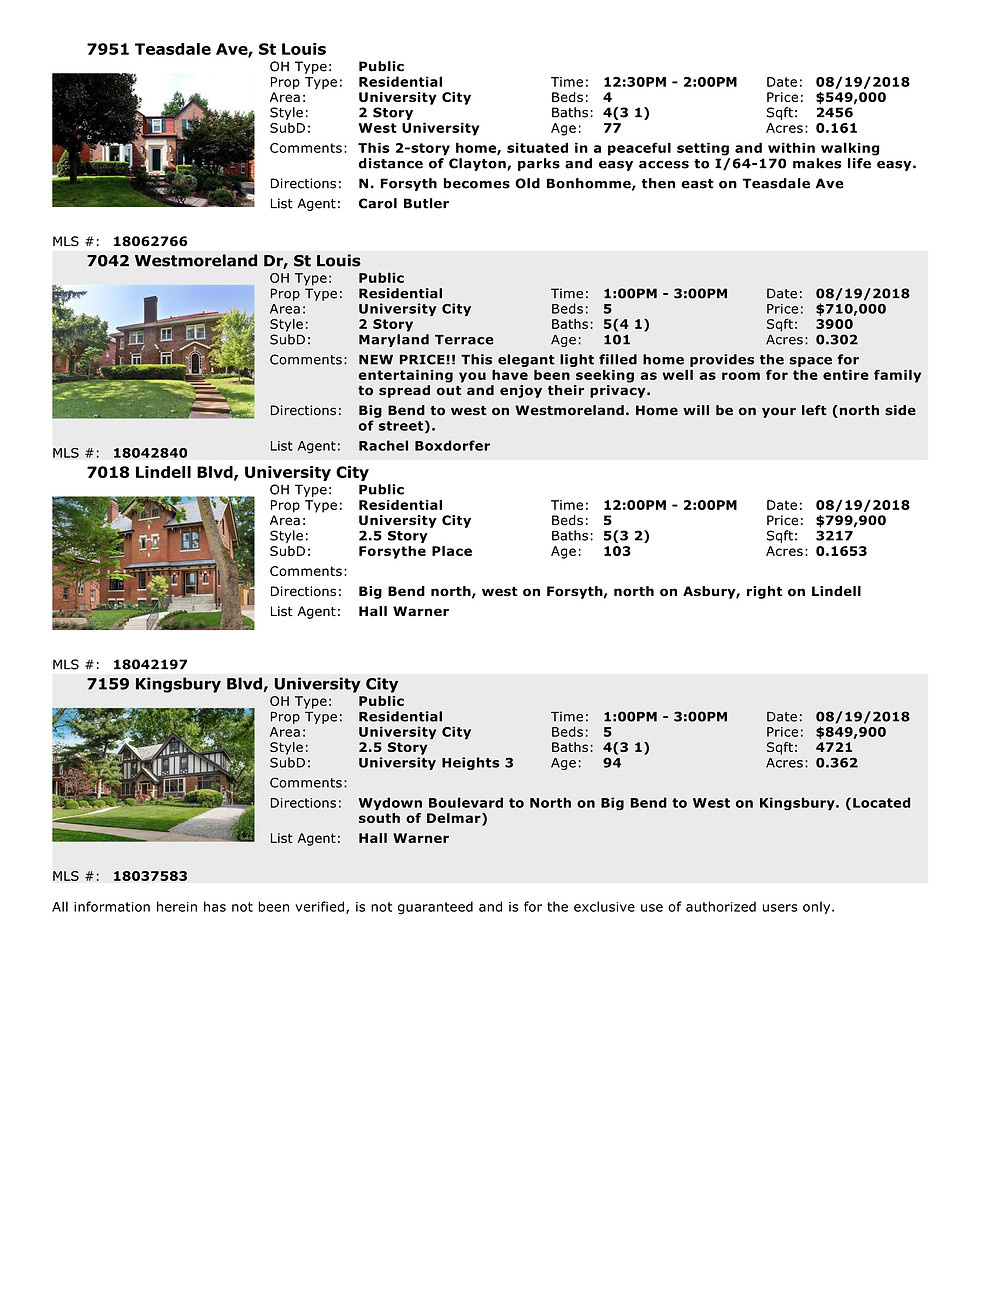 University City Open Houses 63130